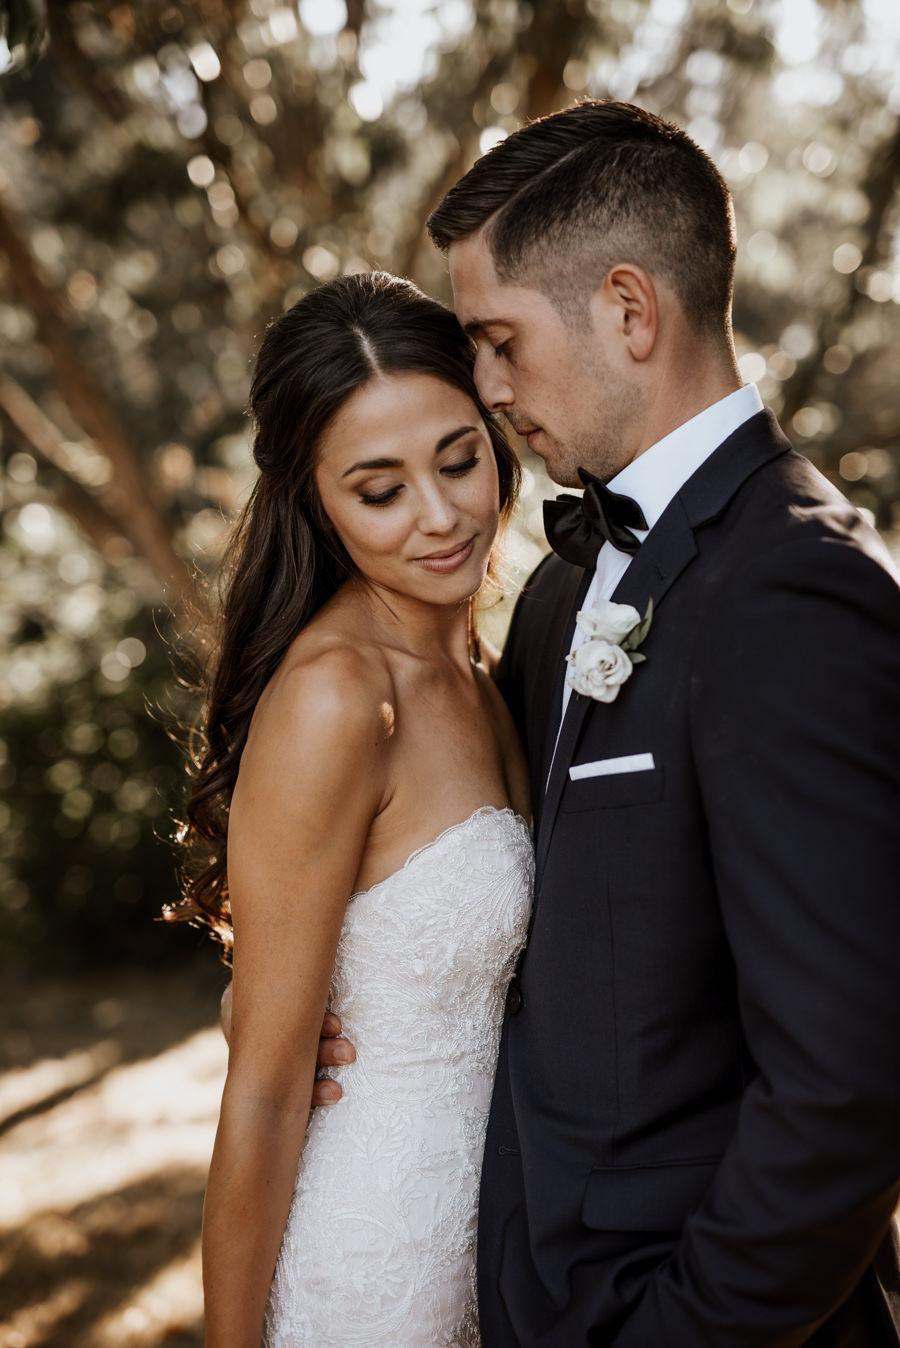 vancouver-wedding-and-elopement-photographer-ubc-botanical-garden-wedding